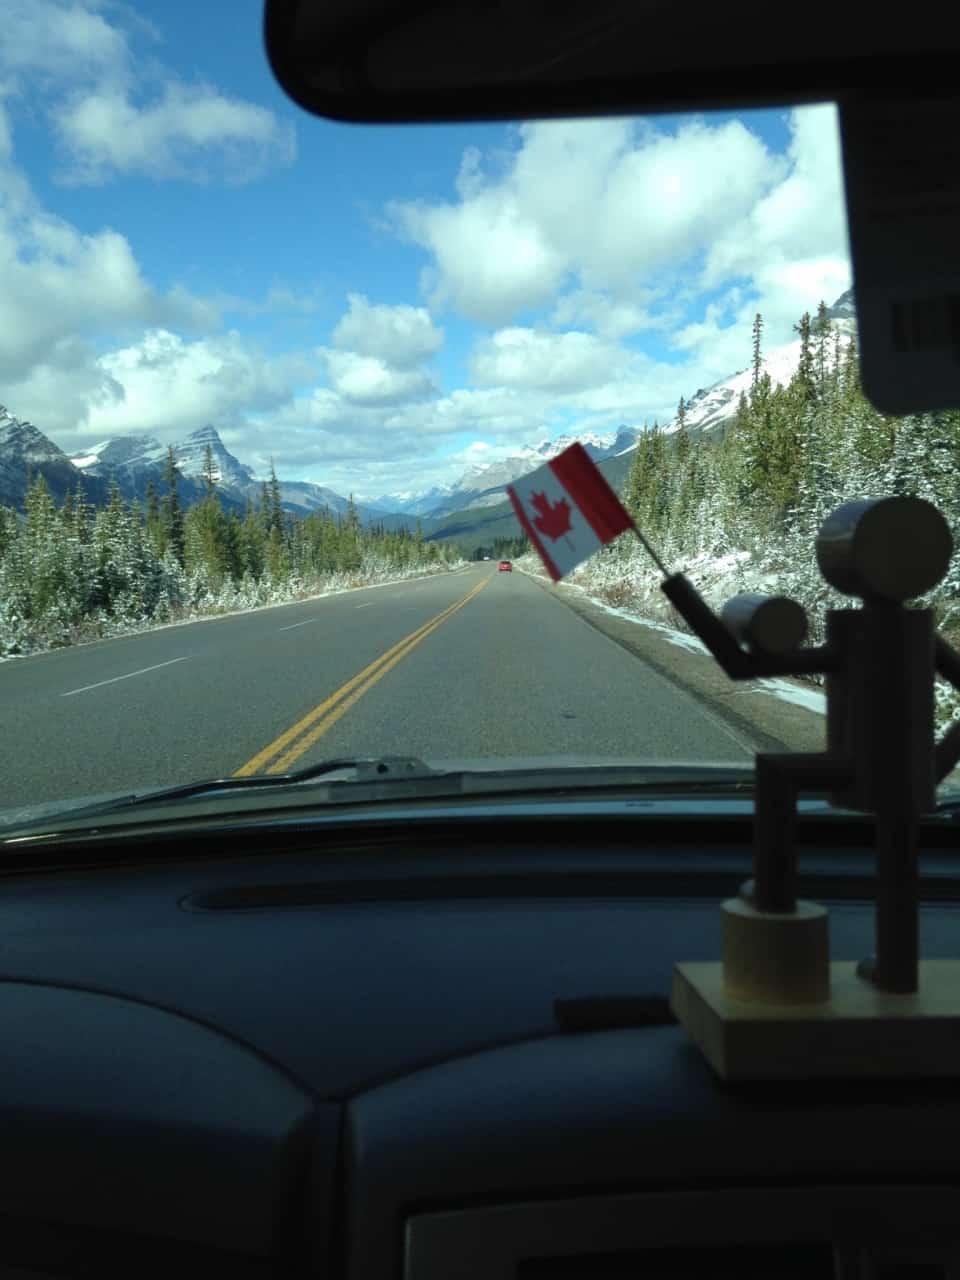 e99c46467dca78cb08f2a099.jpg - Jasper parkway, AB - Calgary road trip fall 2014<br />Pride of place